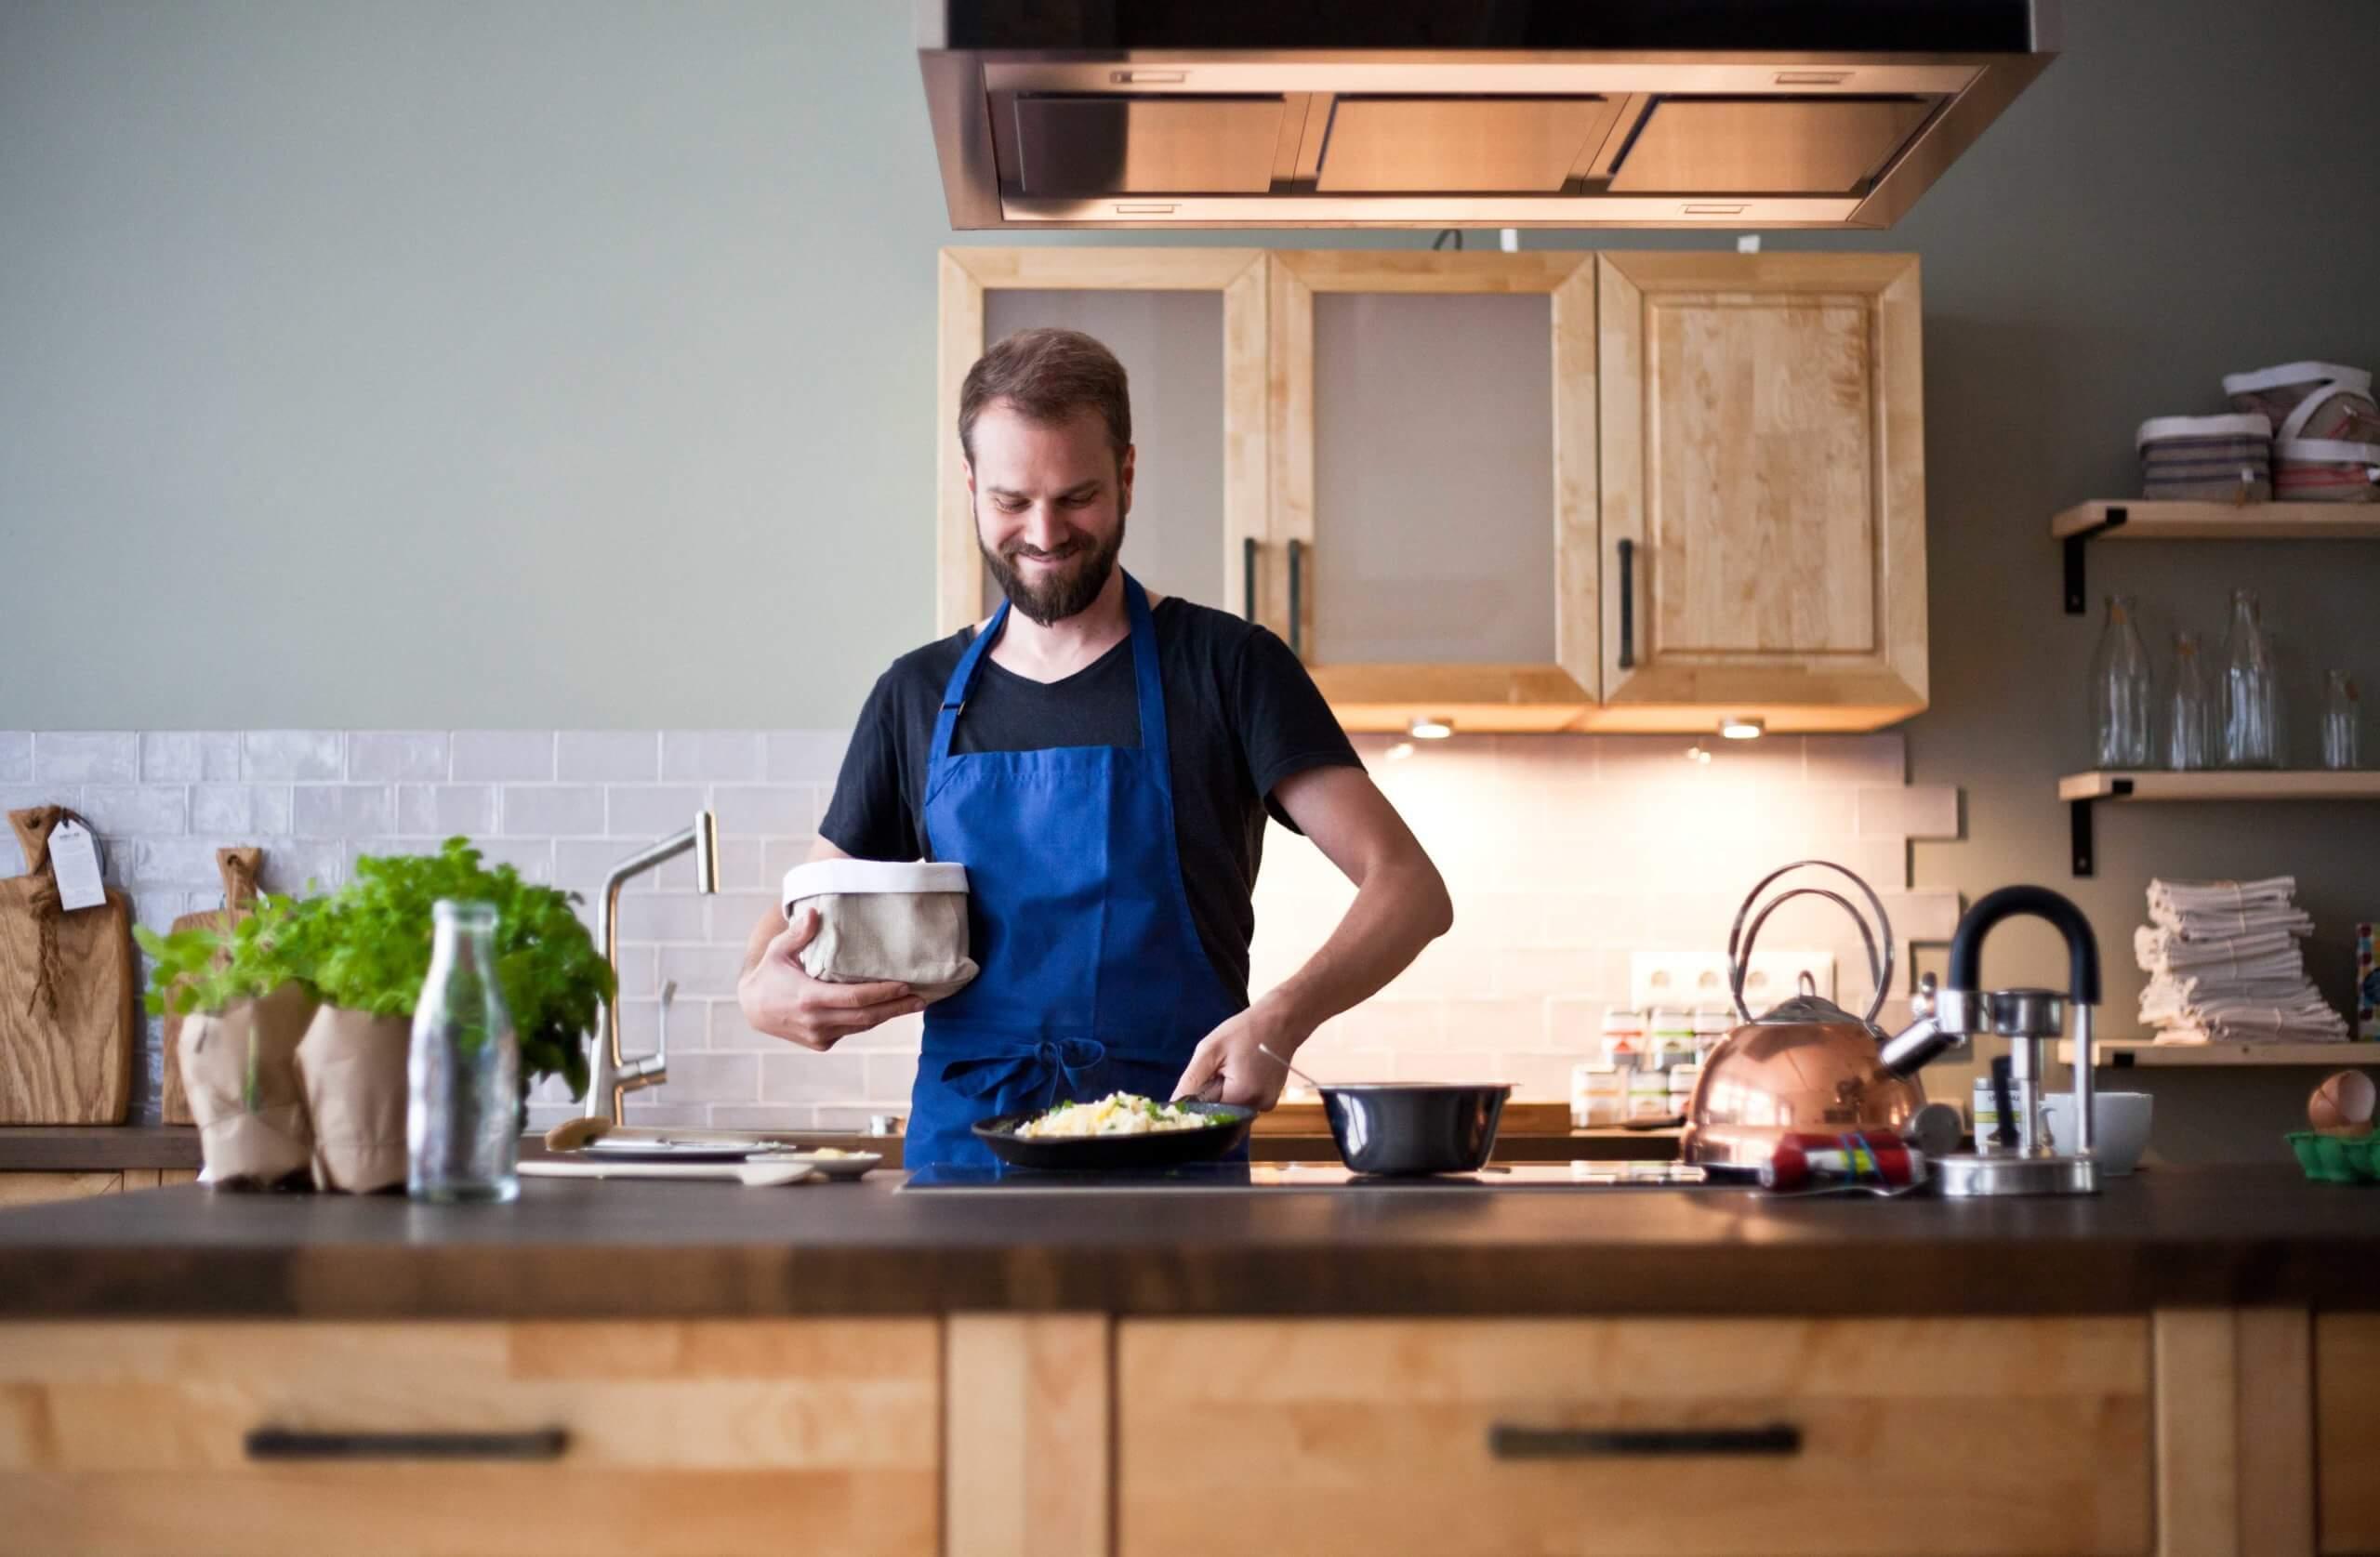 kitchen_impossible_echtholz_nachhaltig_fair_massivholz_kueche_skandinavisches_design_made_in_berlin3